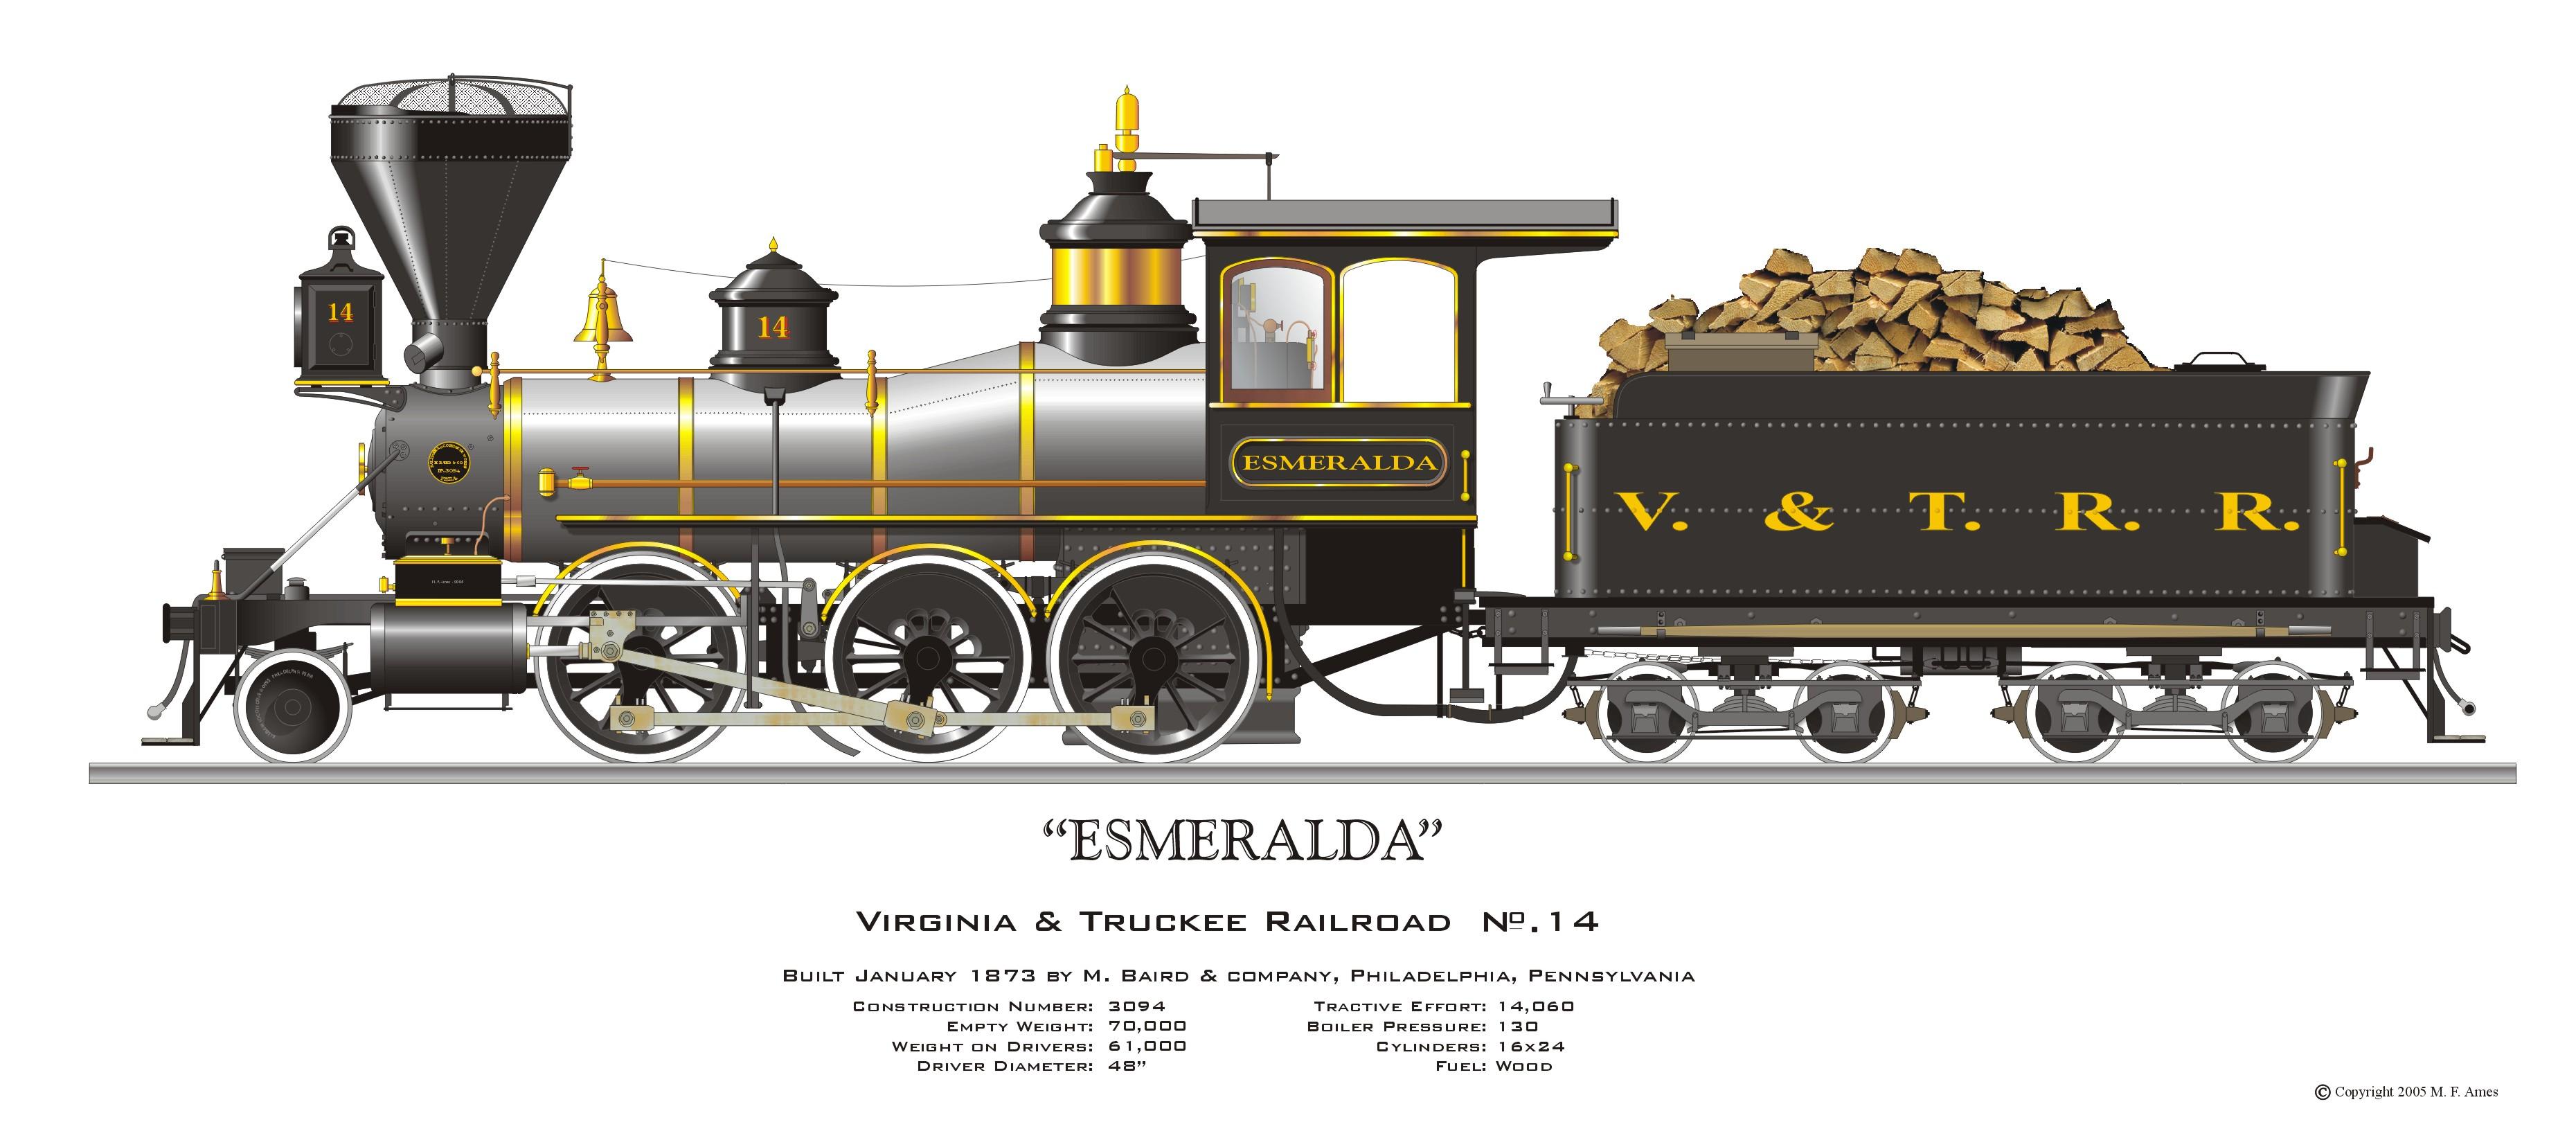 Steam Locomotive Drawing at GetDrawings.com.